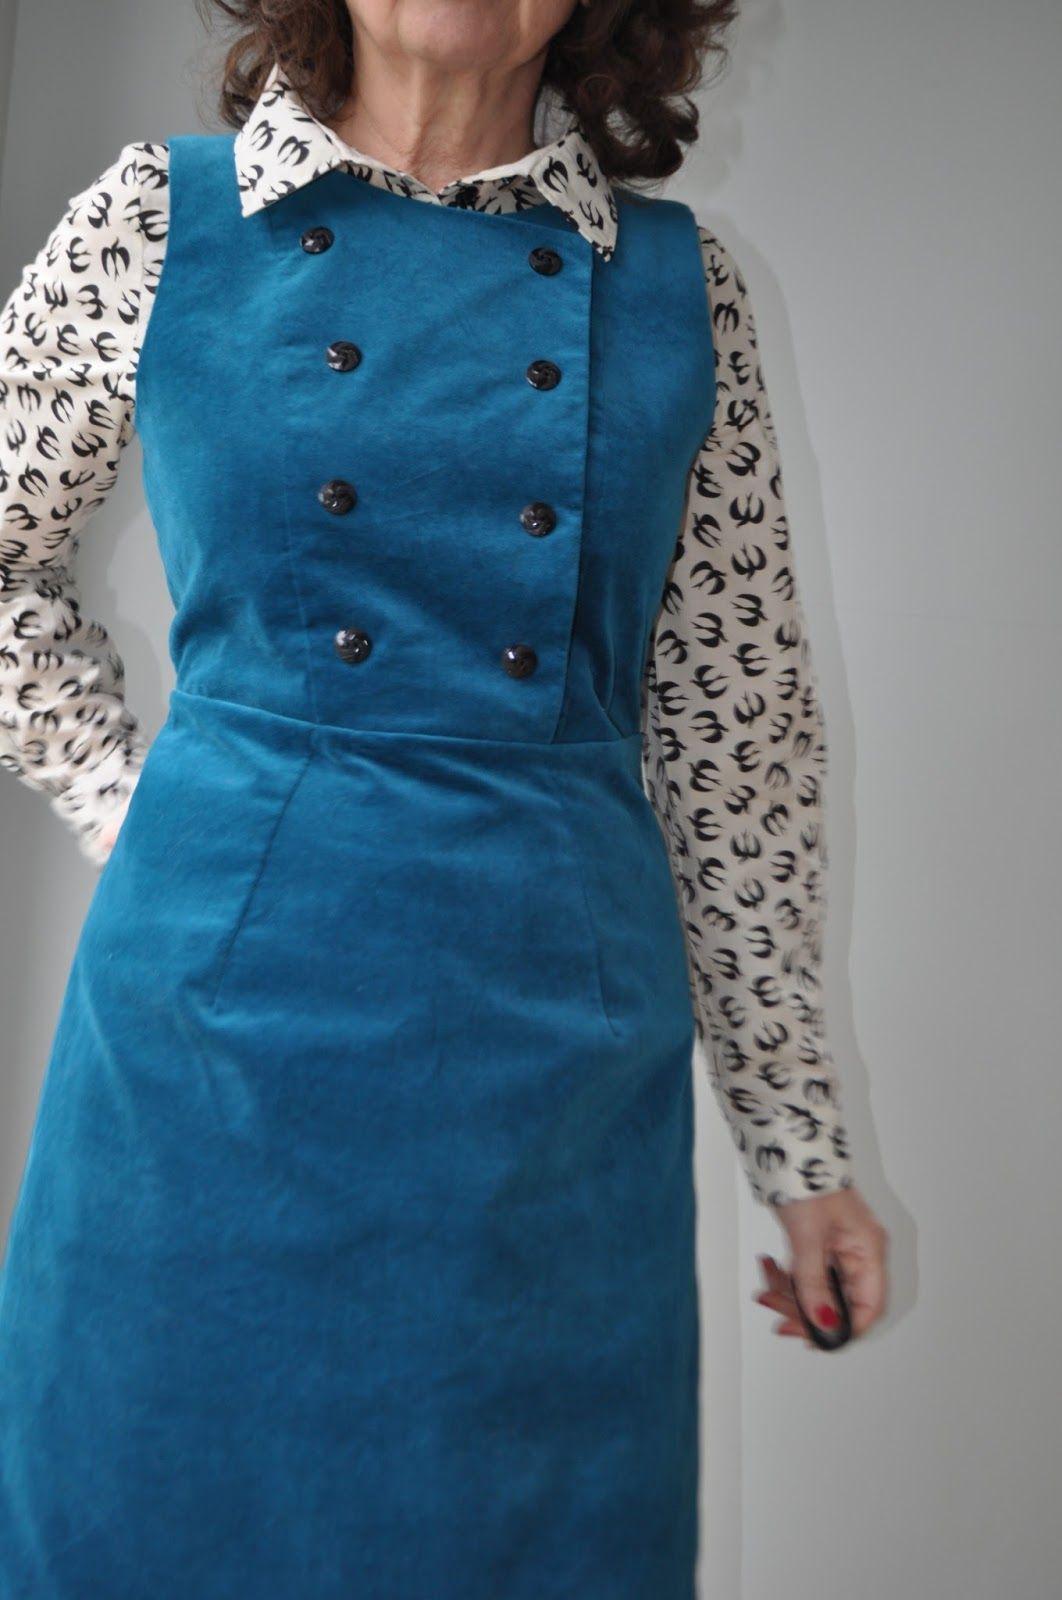 5564322ecf Phoebe dress by mags creative meanderings